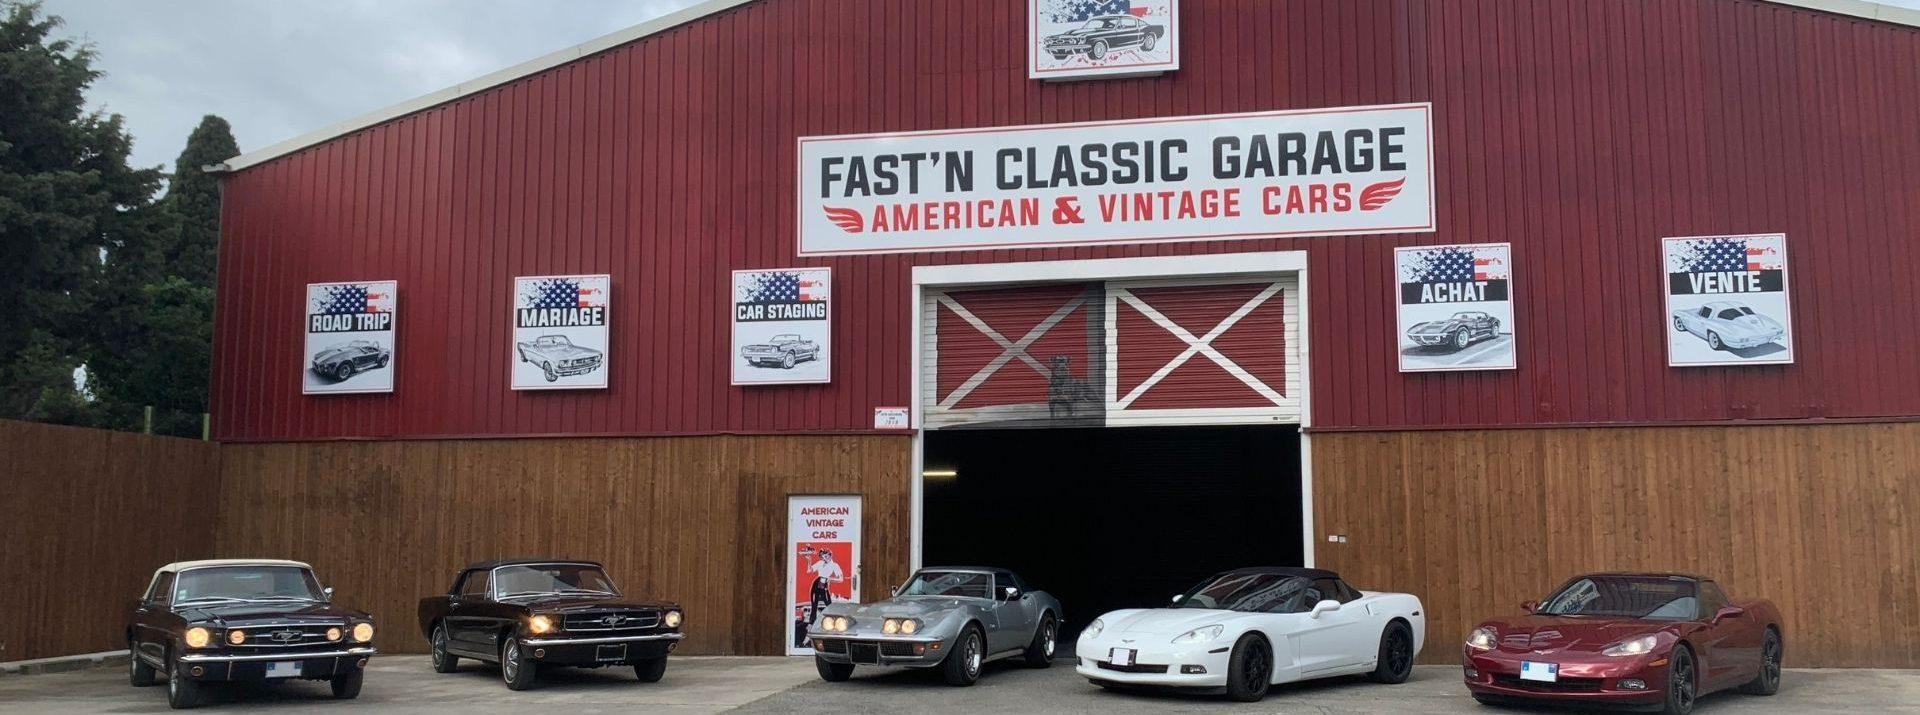 Garage Fast'n Classic